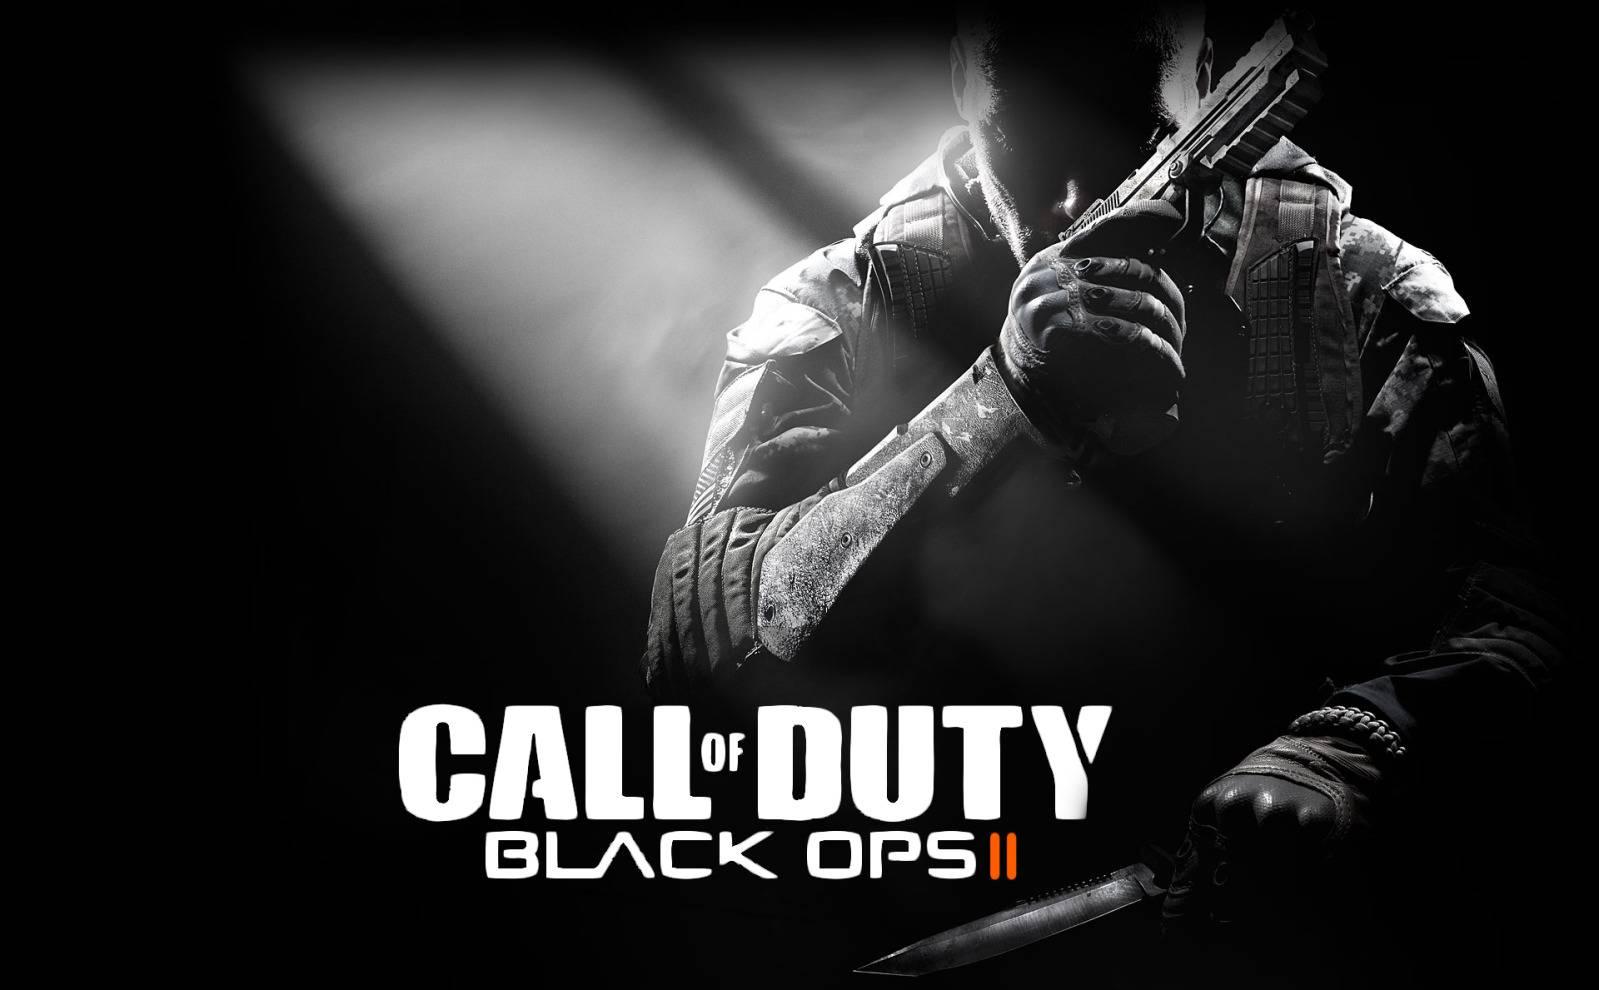 Call Duty Black Ops 2